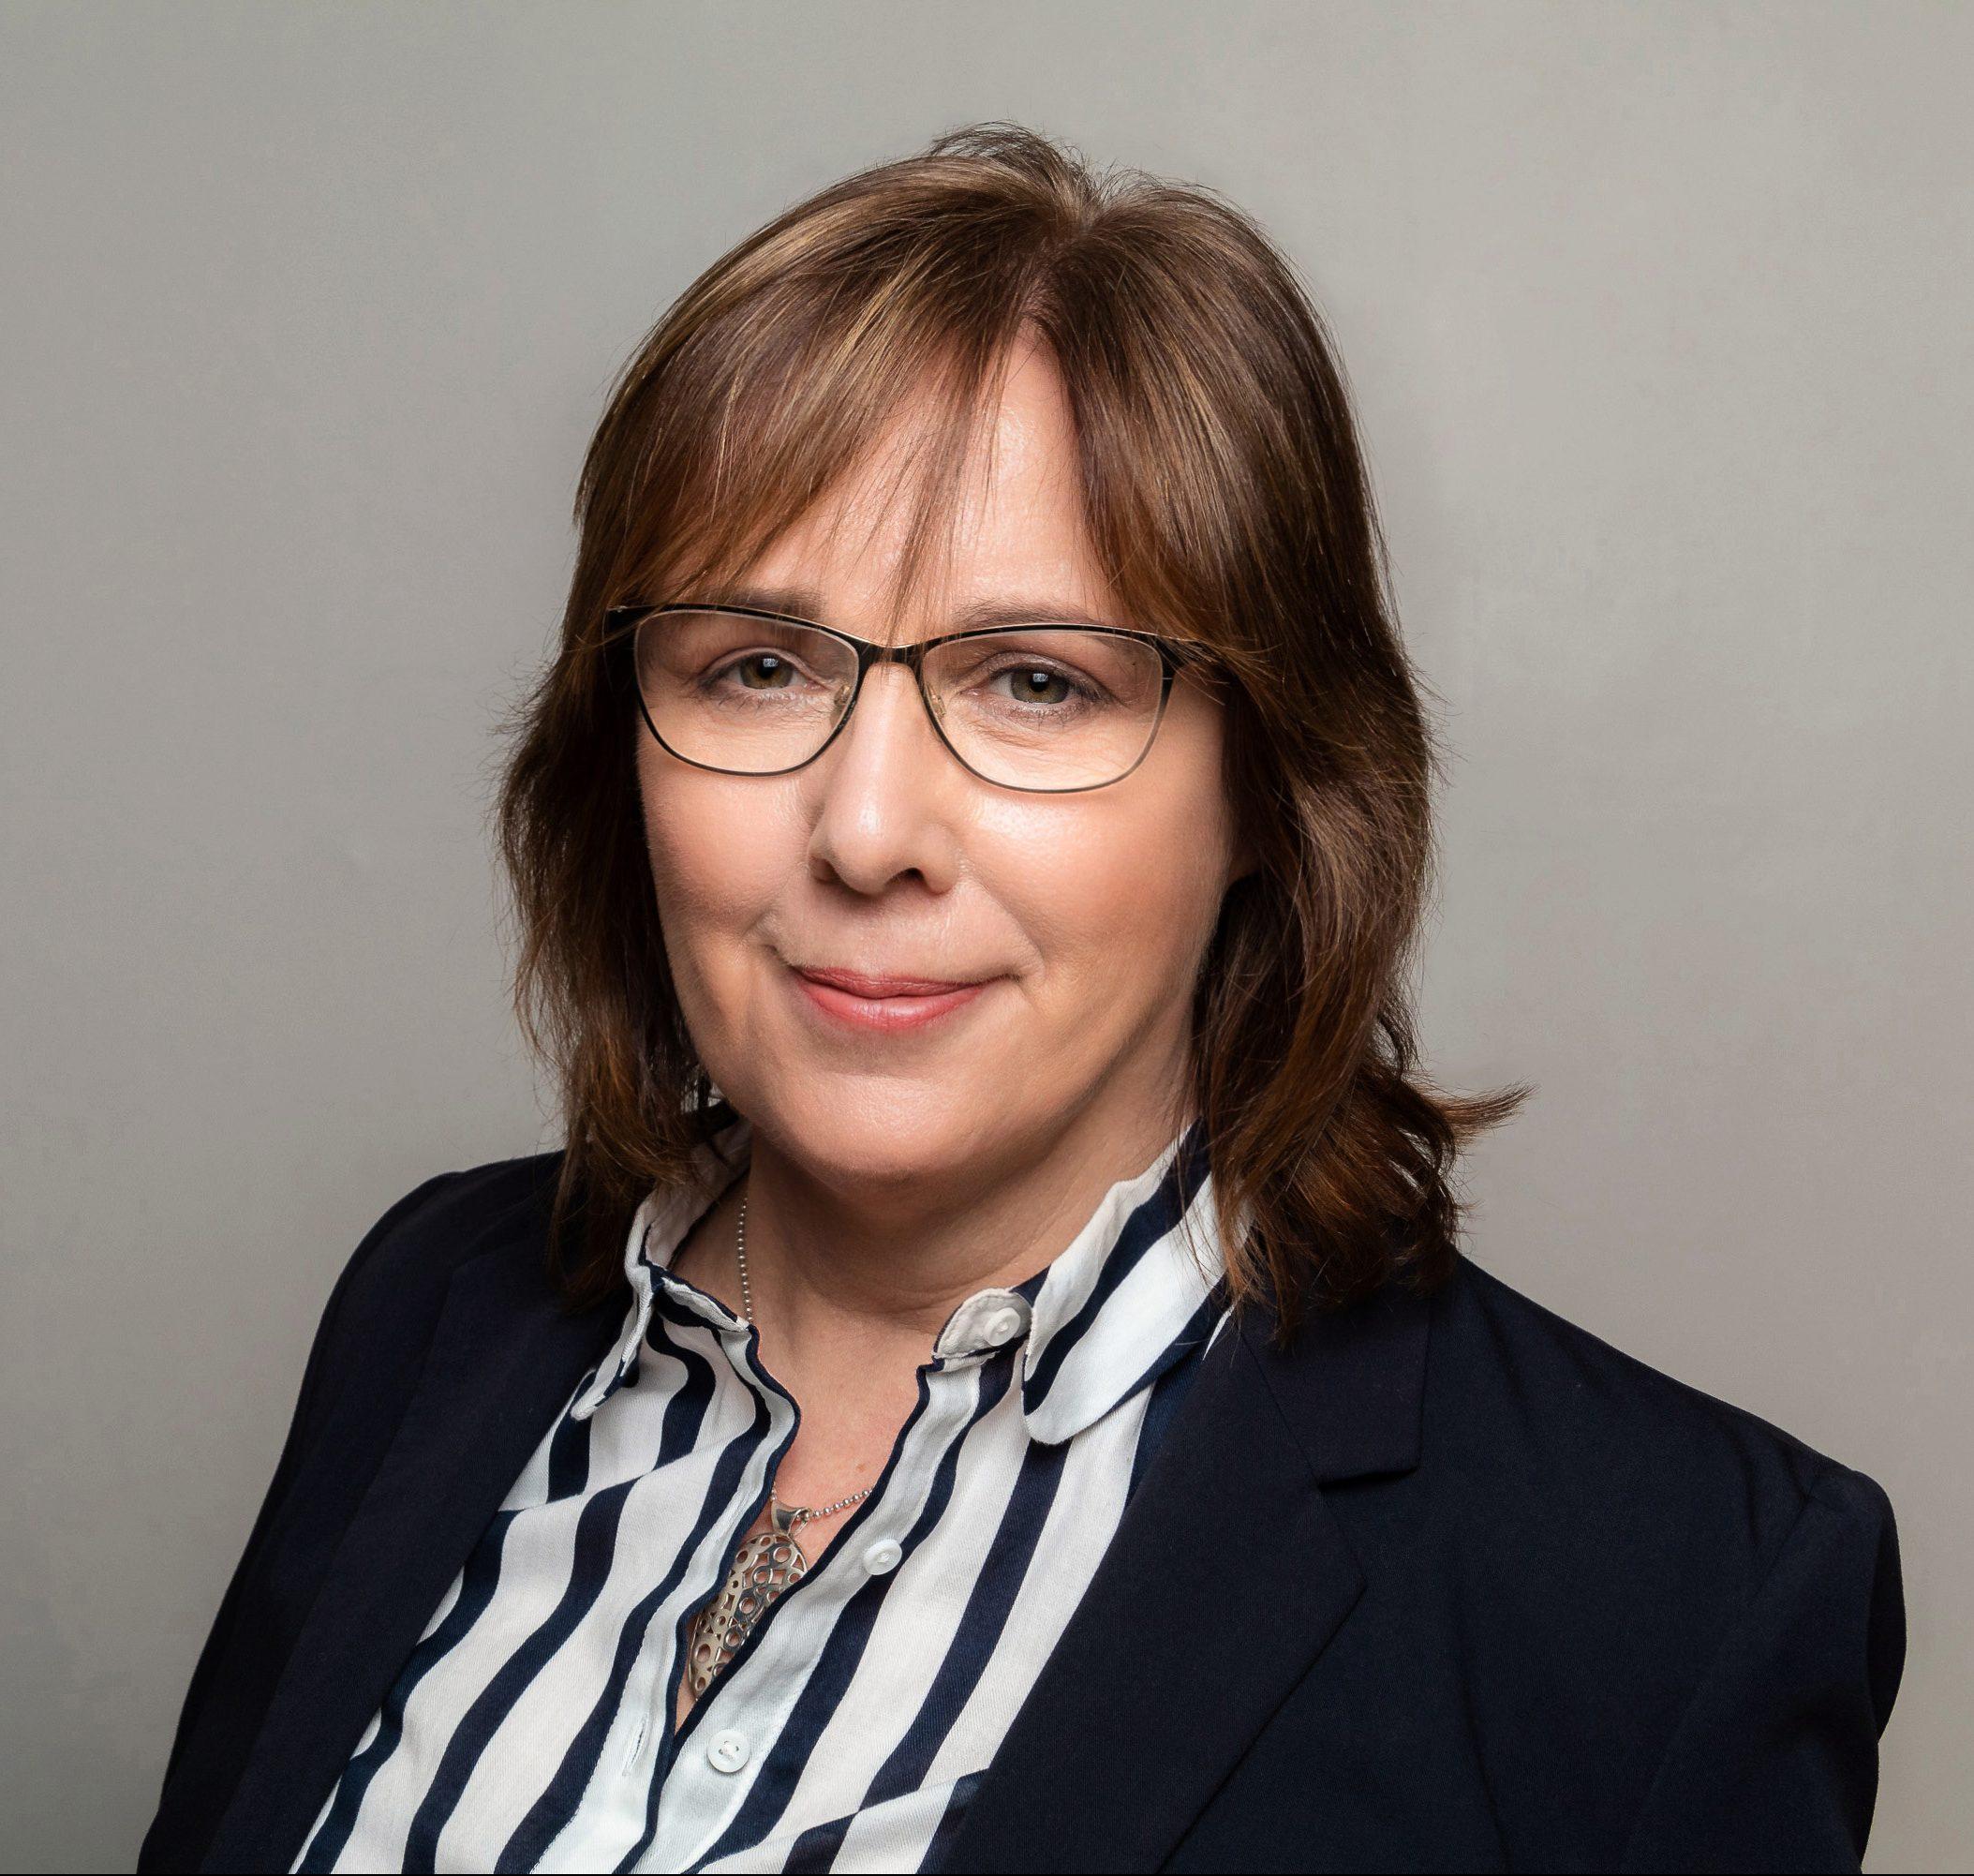 Maggie Strudwick